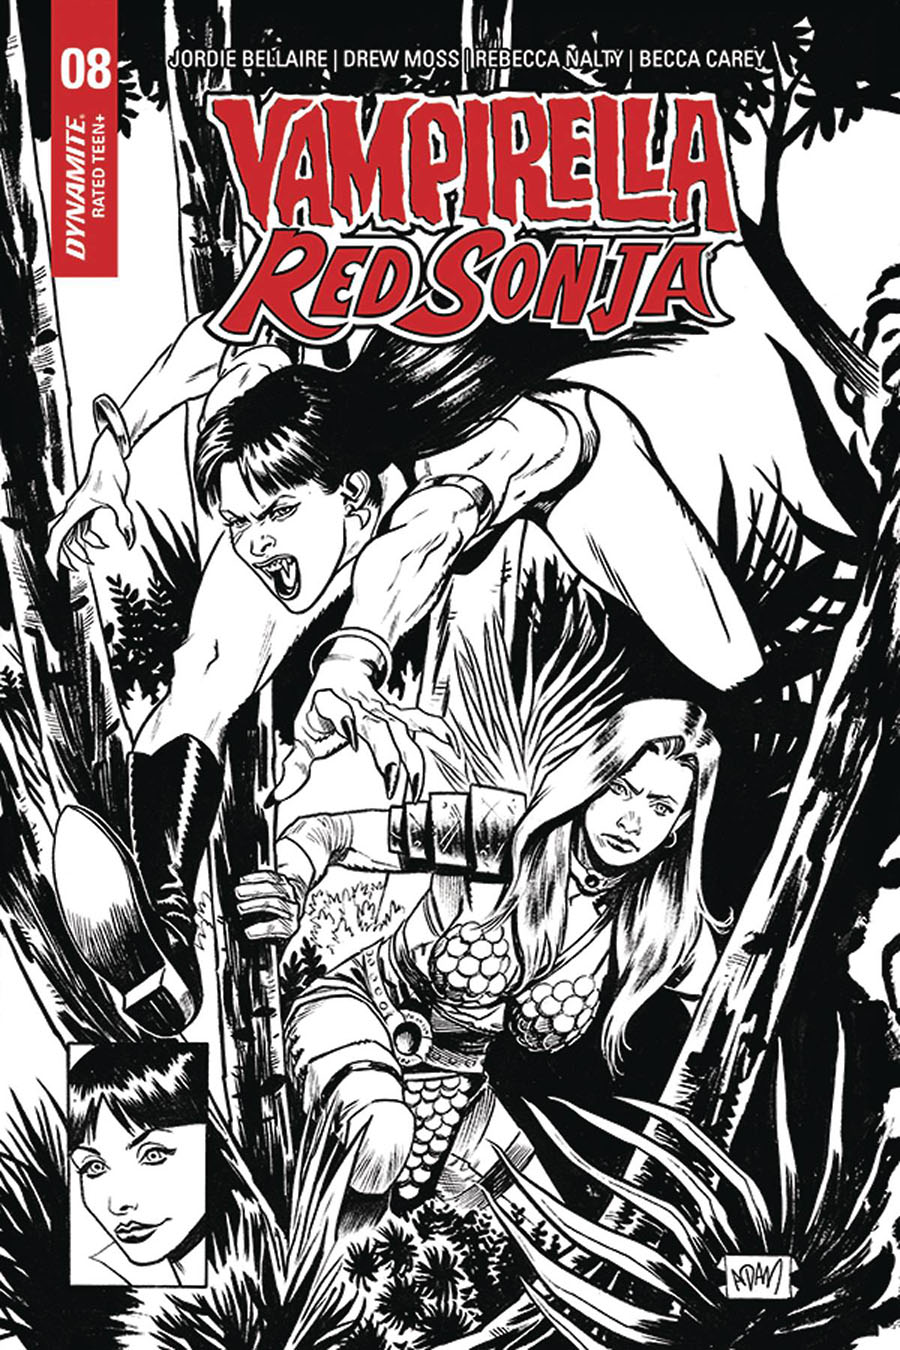 Vampirella Red Sonja #8 Cover K Incentive Adam Gorham Todd McFarlane Homage Black & White Variant Cover